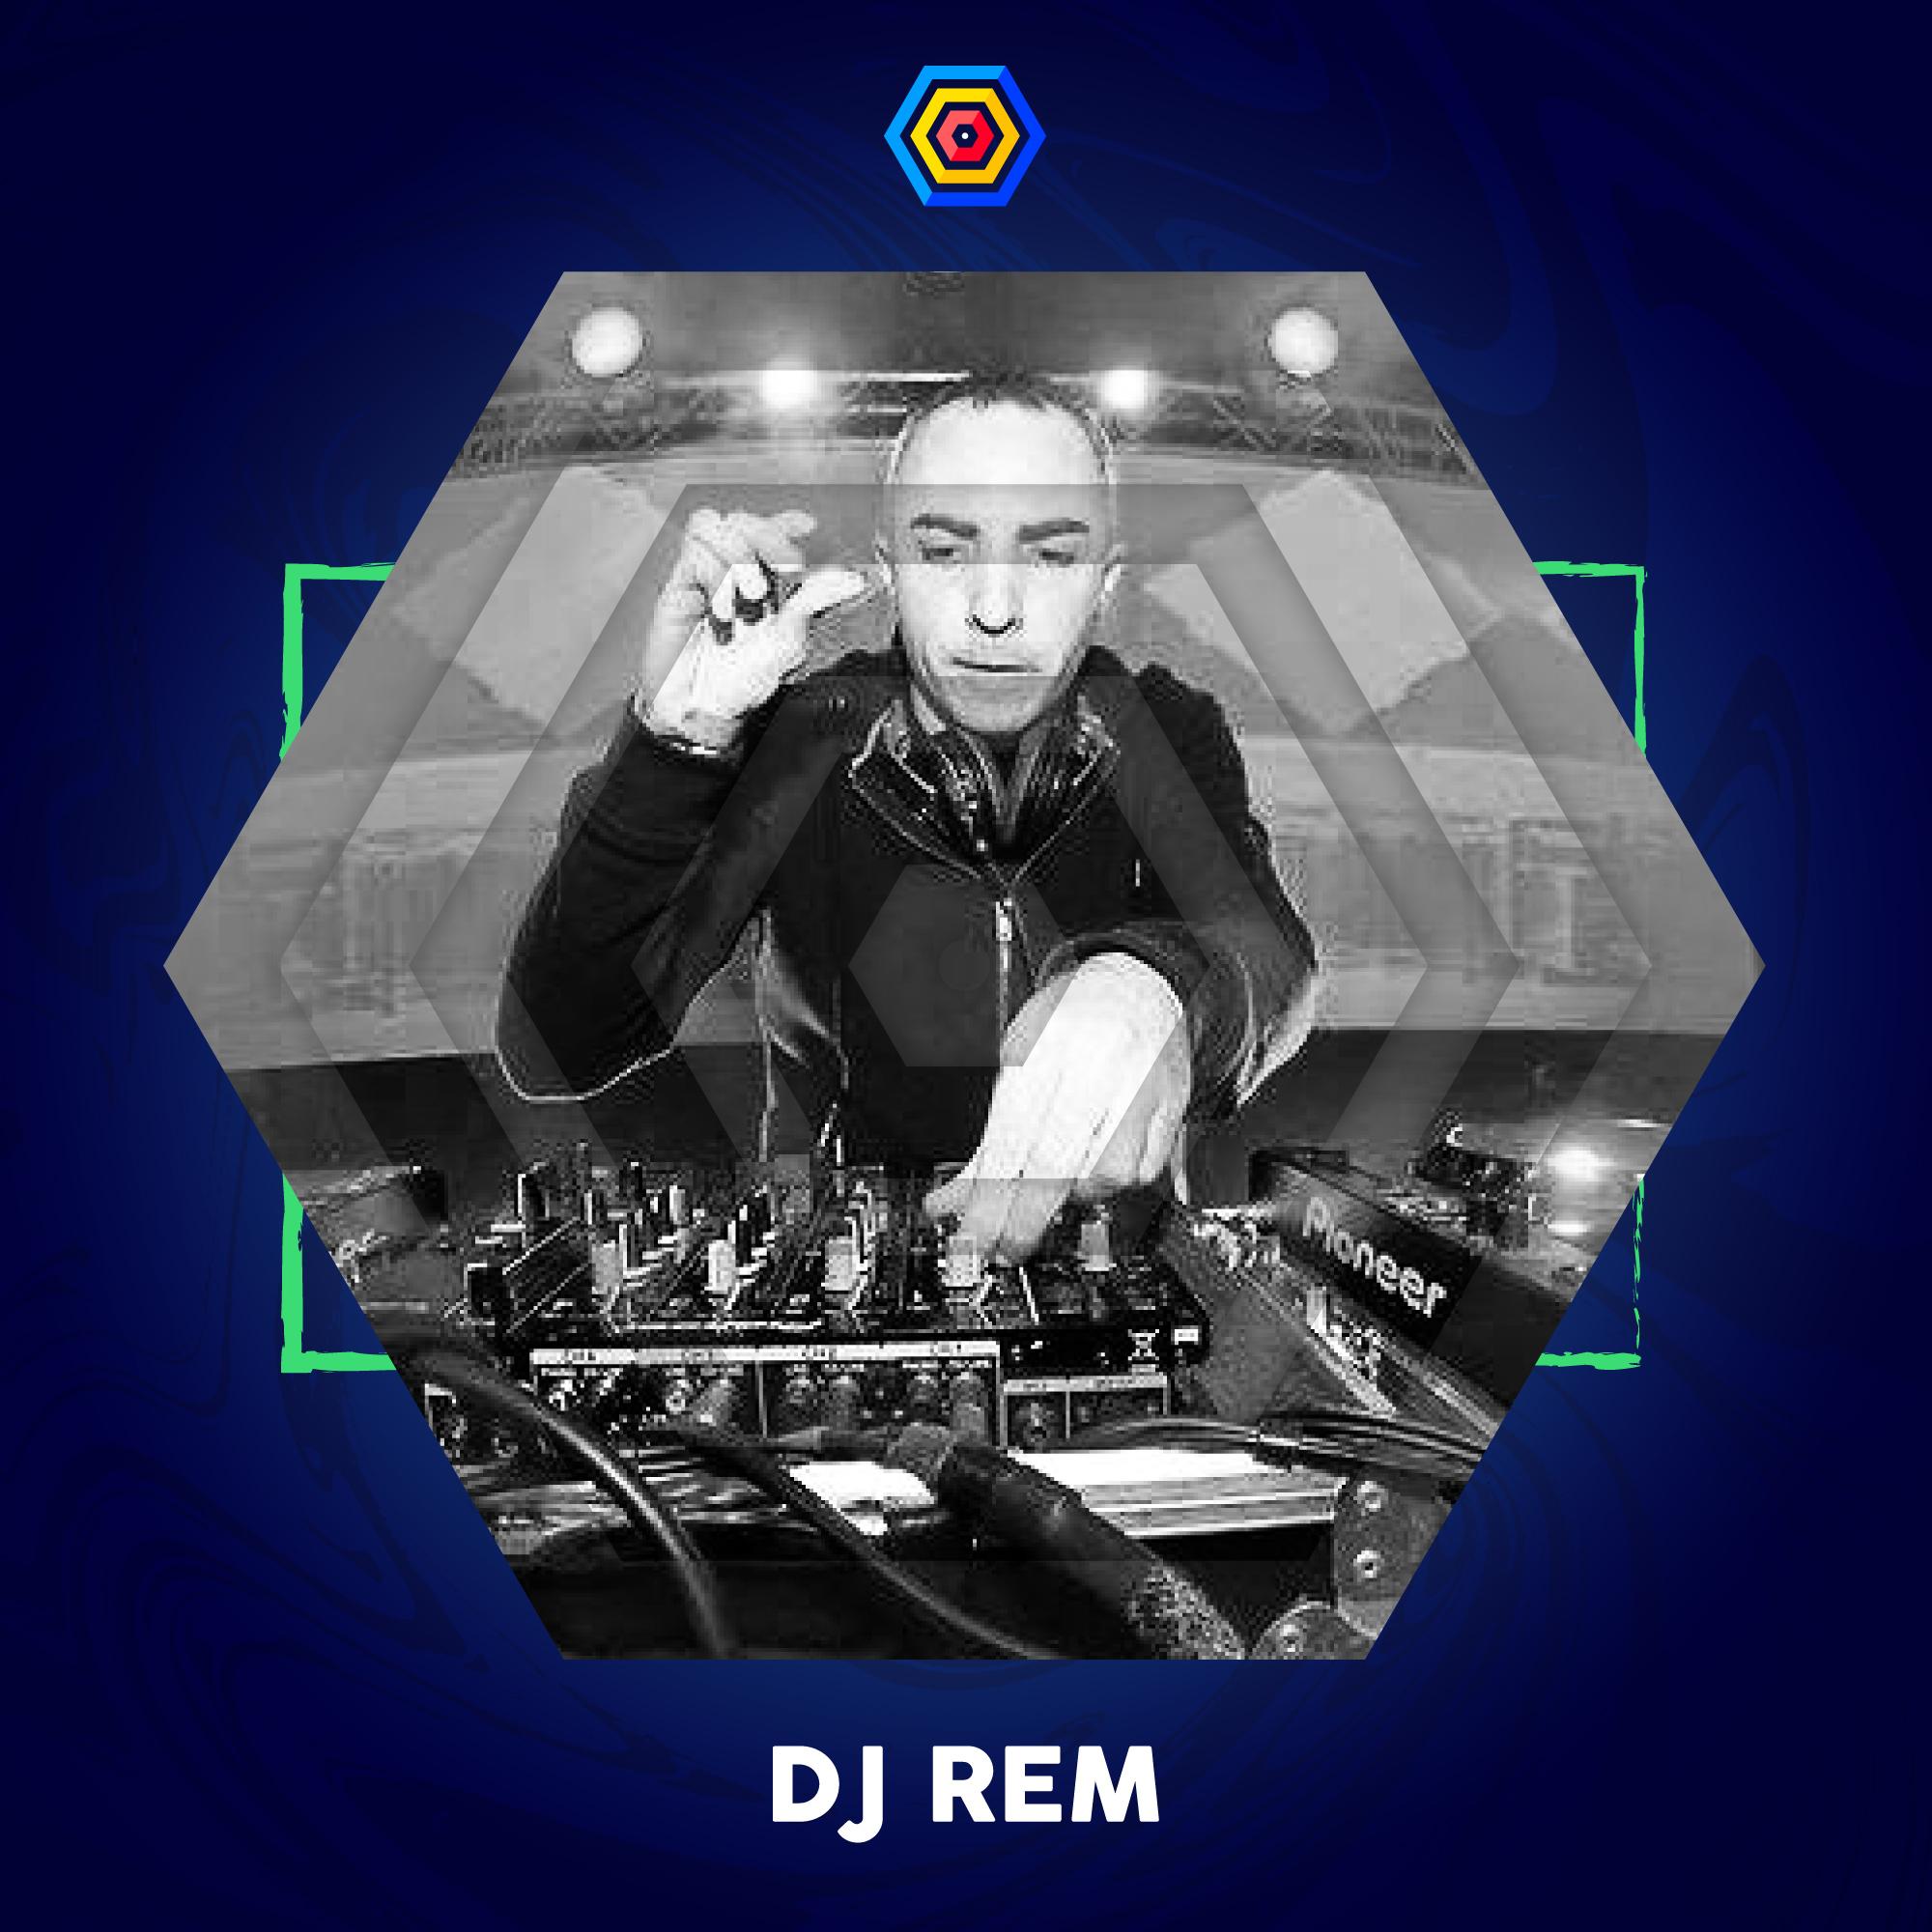 DJ-REM